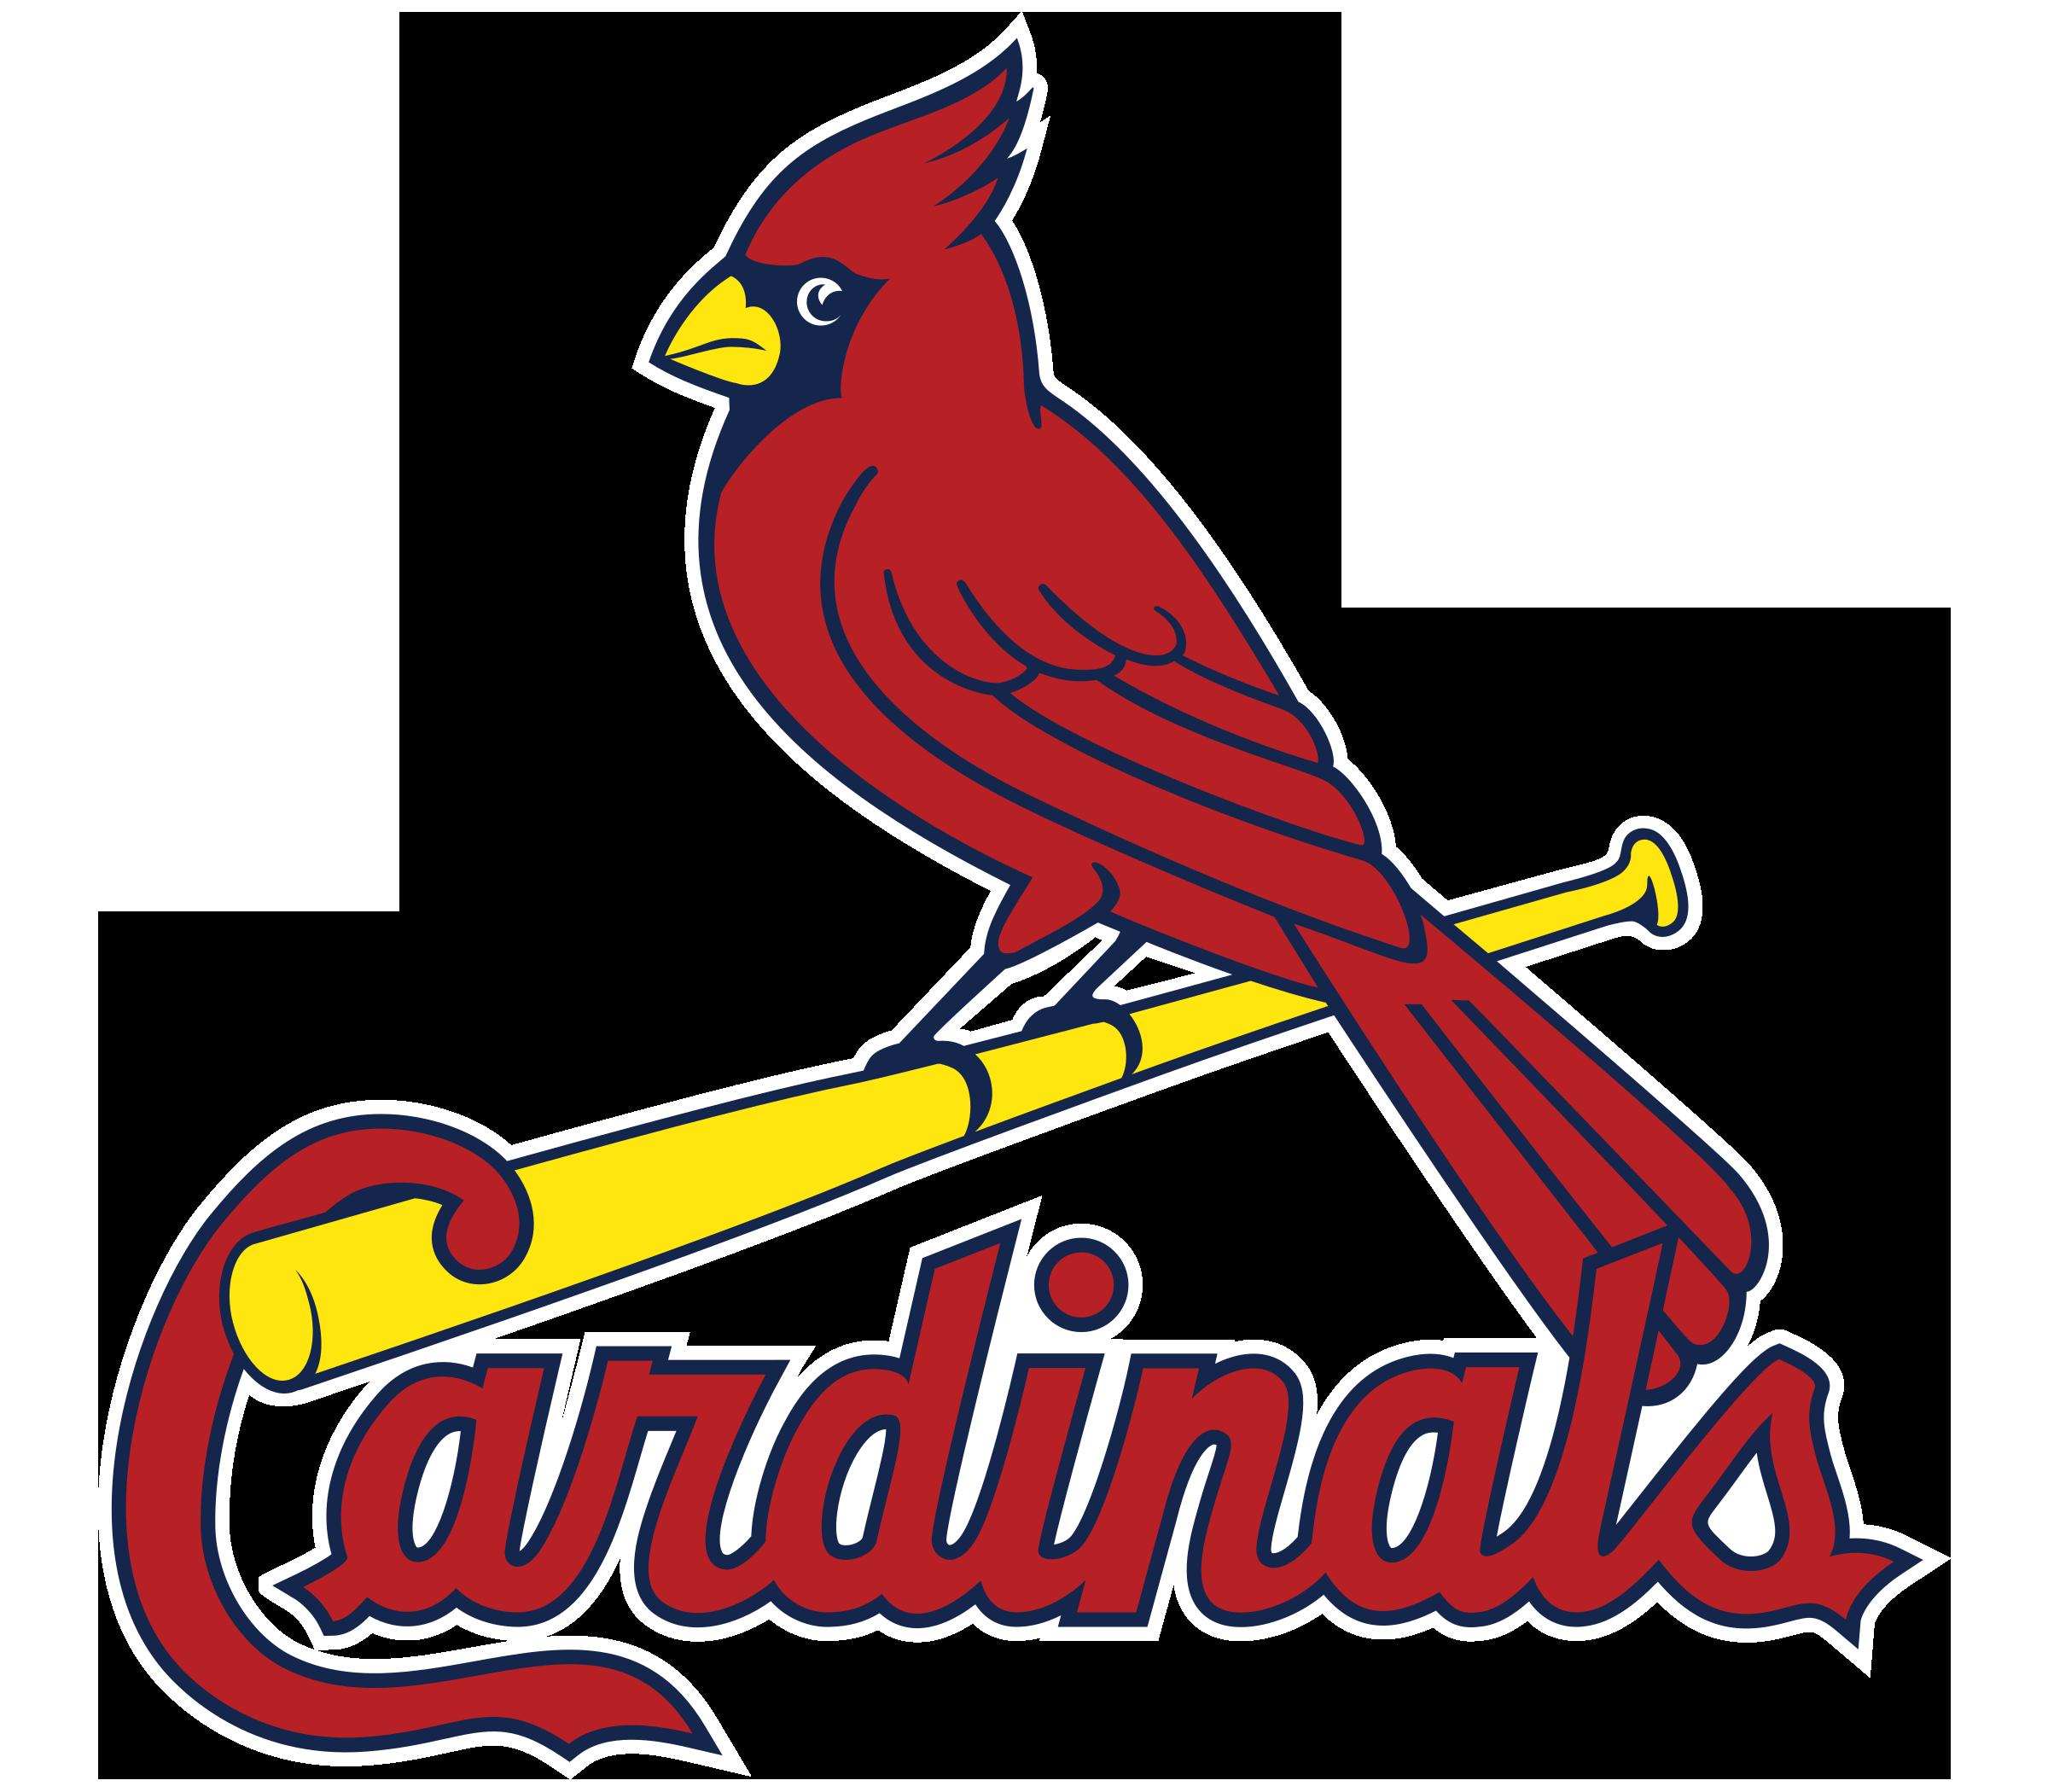 St Louis Cardinals Logo Png Transparent Svg Vector Freebie Supply St Louis Cardinals Baseball Stl Cardinals Baseball St Louis Cardinals